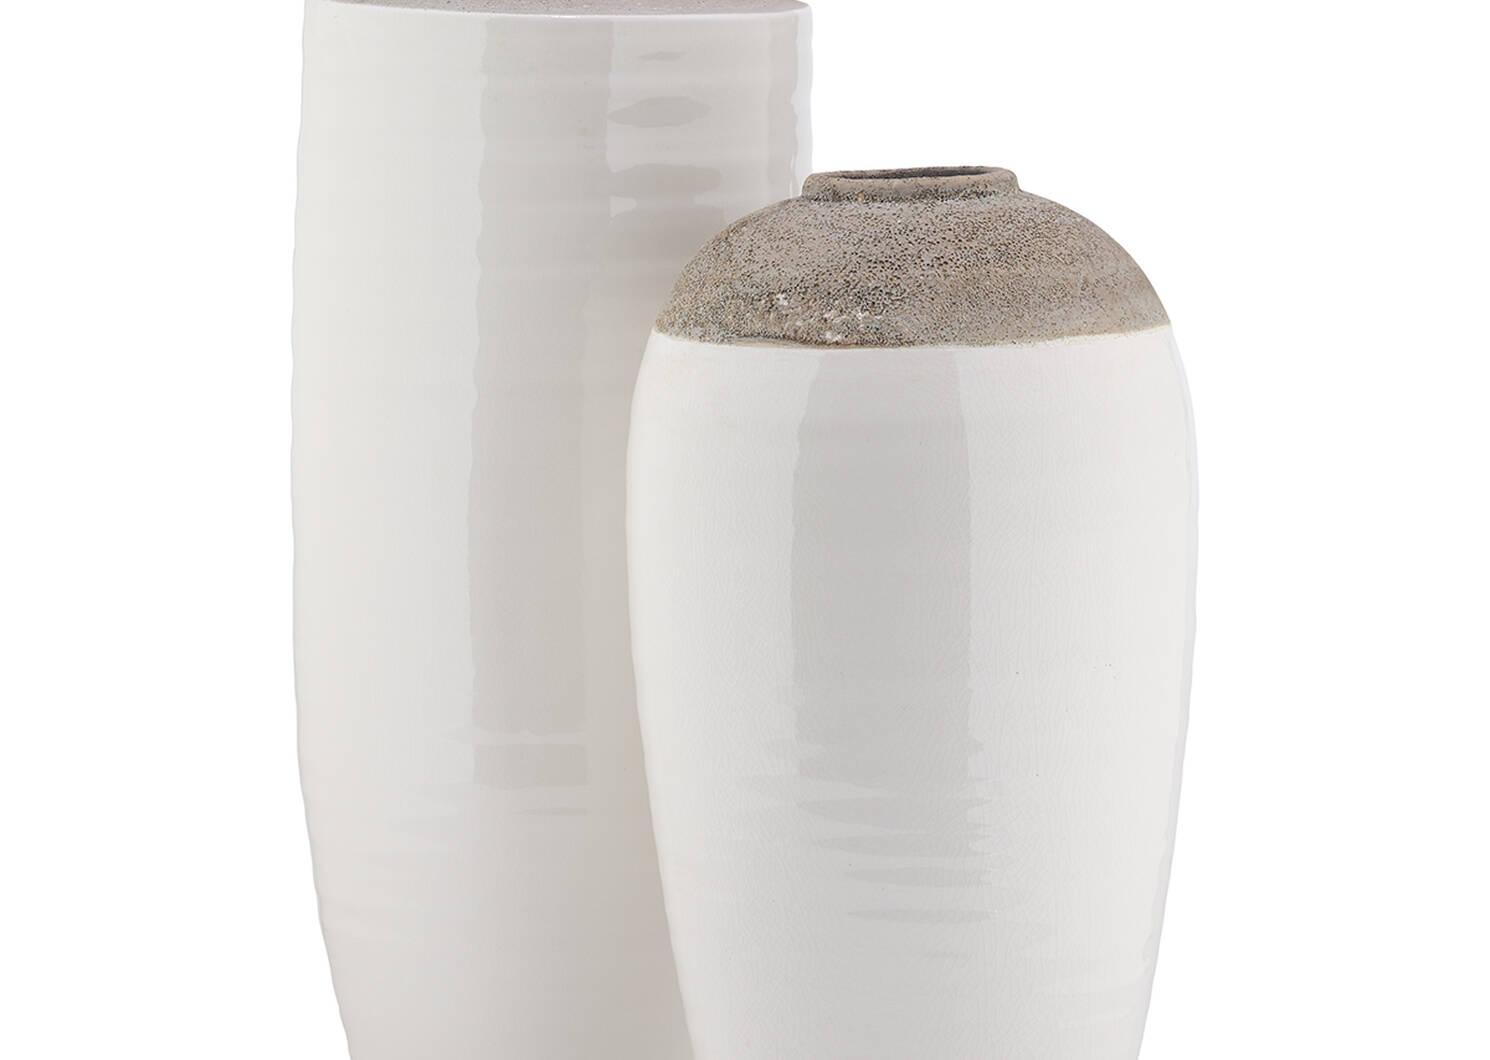 Grand vase Janis blanc